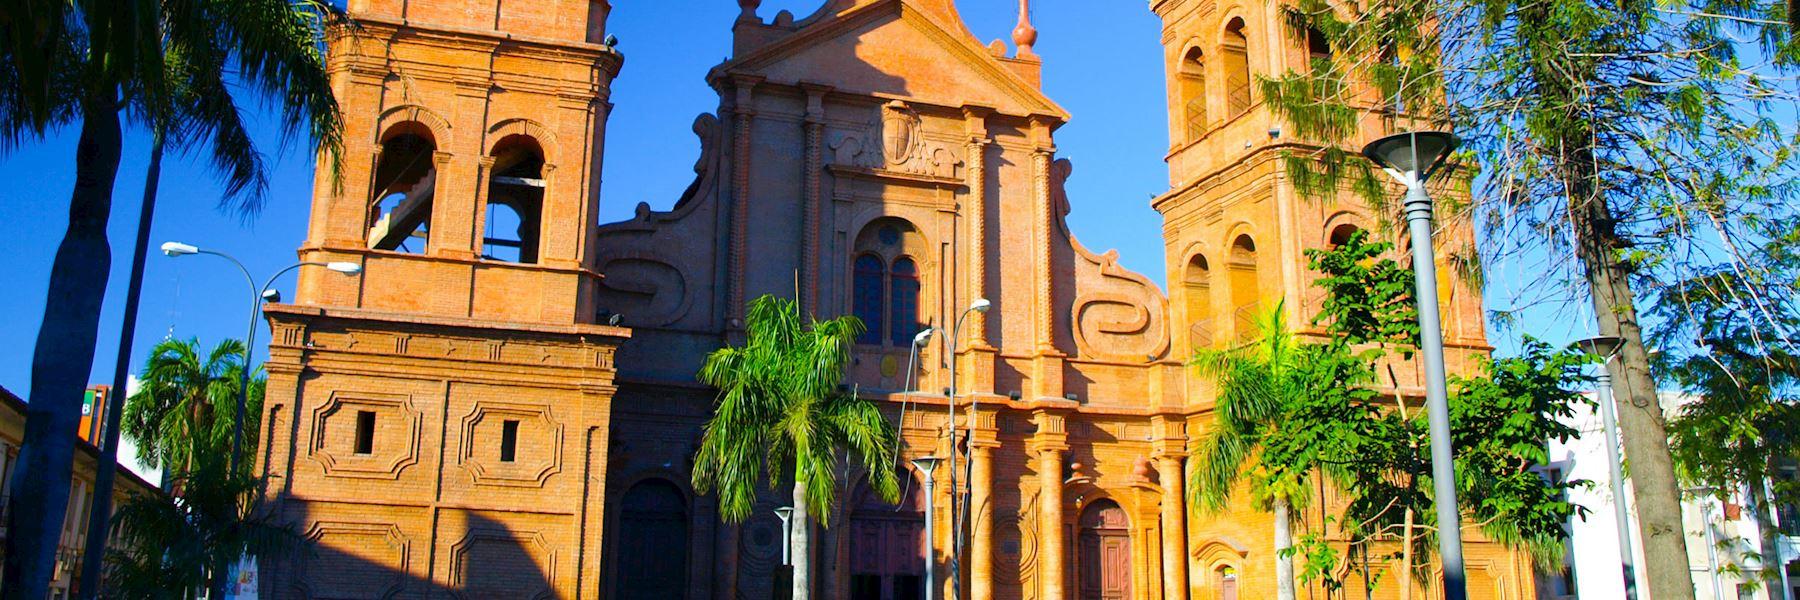 Visit Santa Cruz & The Jesuit Missions, Bolivia